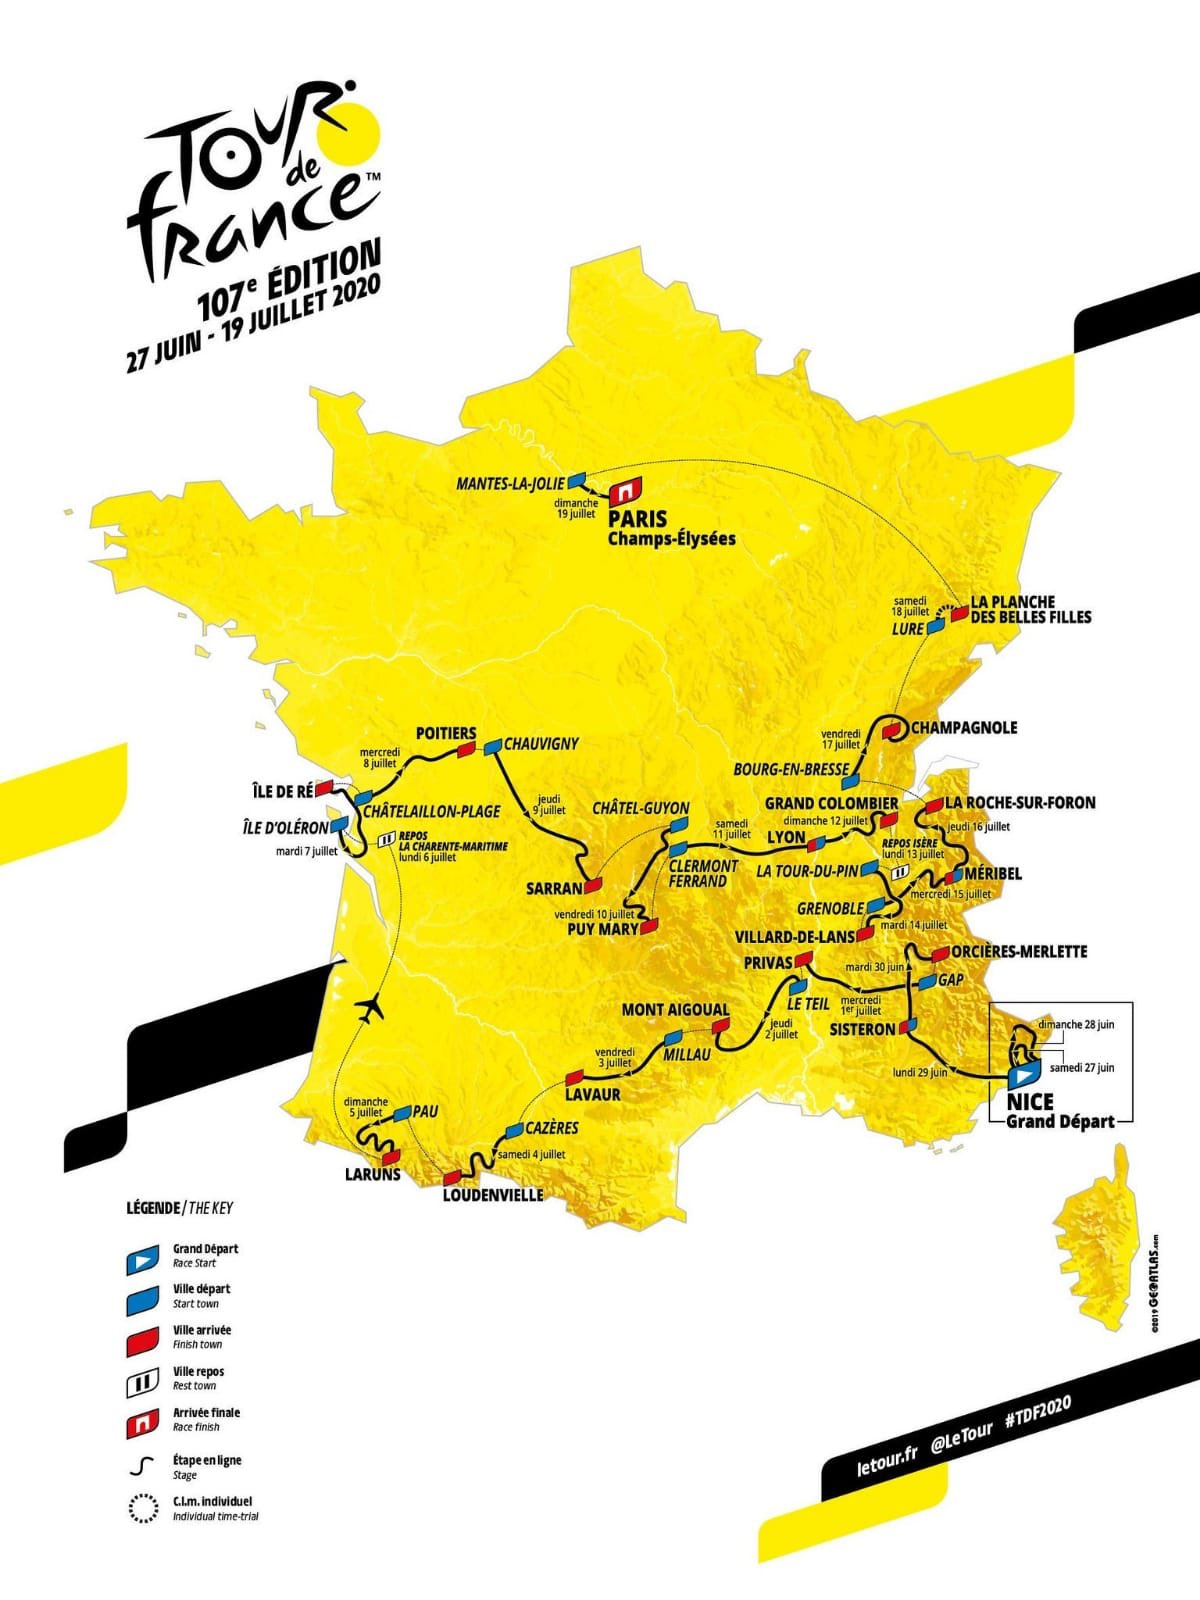 etapas del tour y recorrido